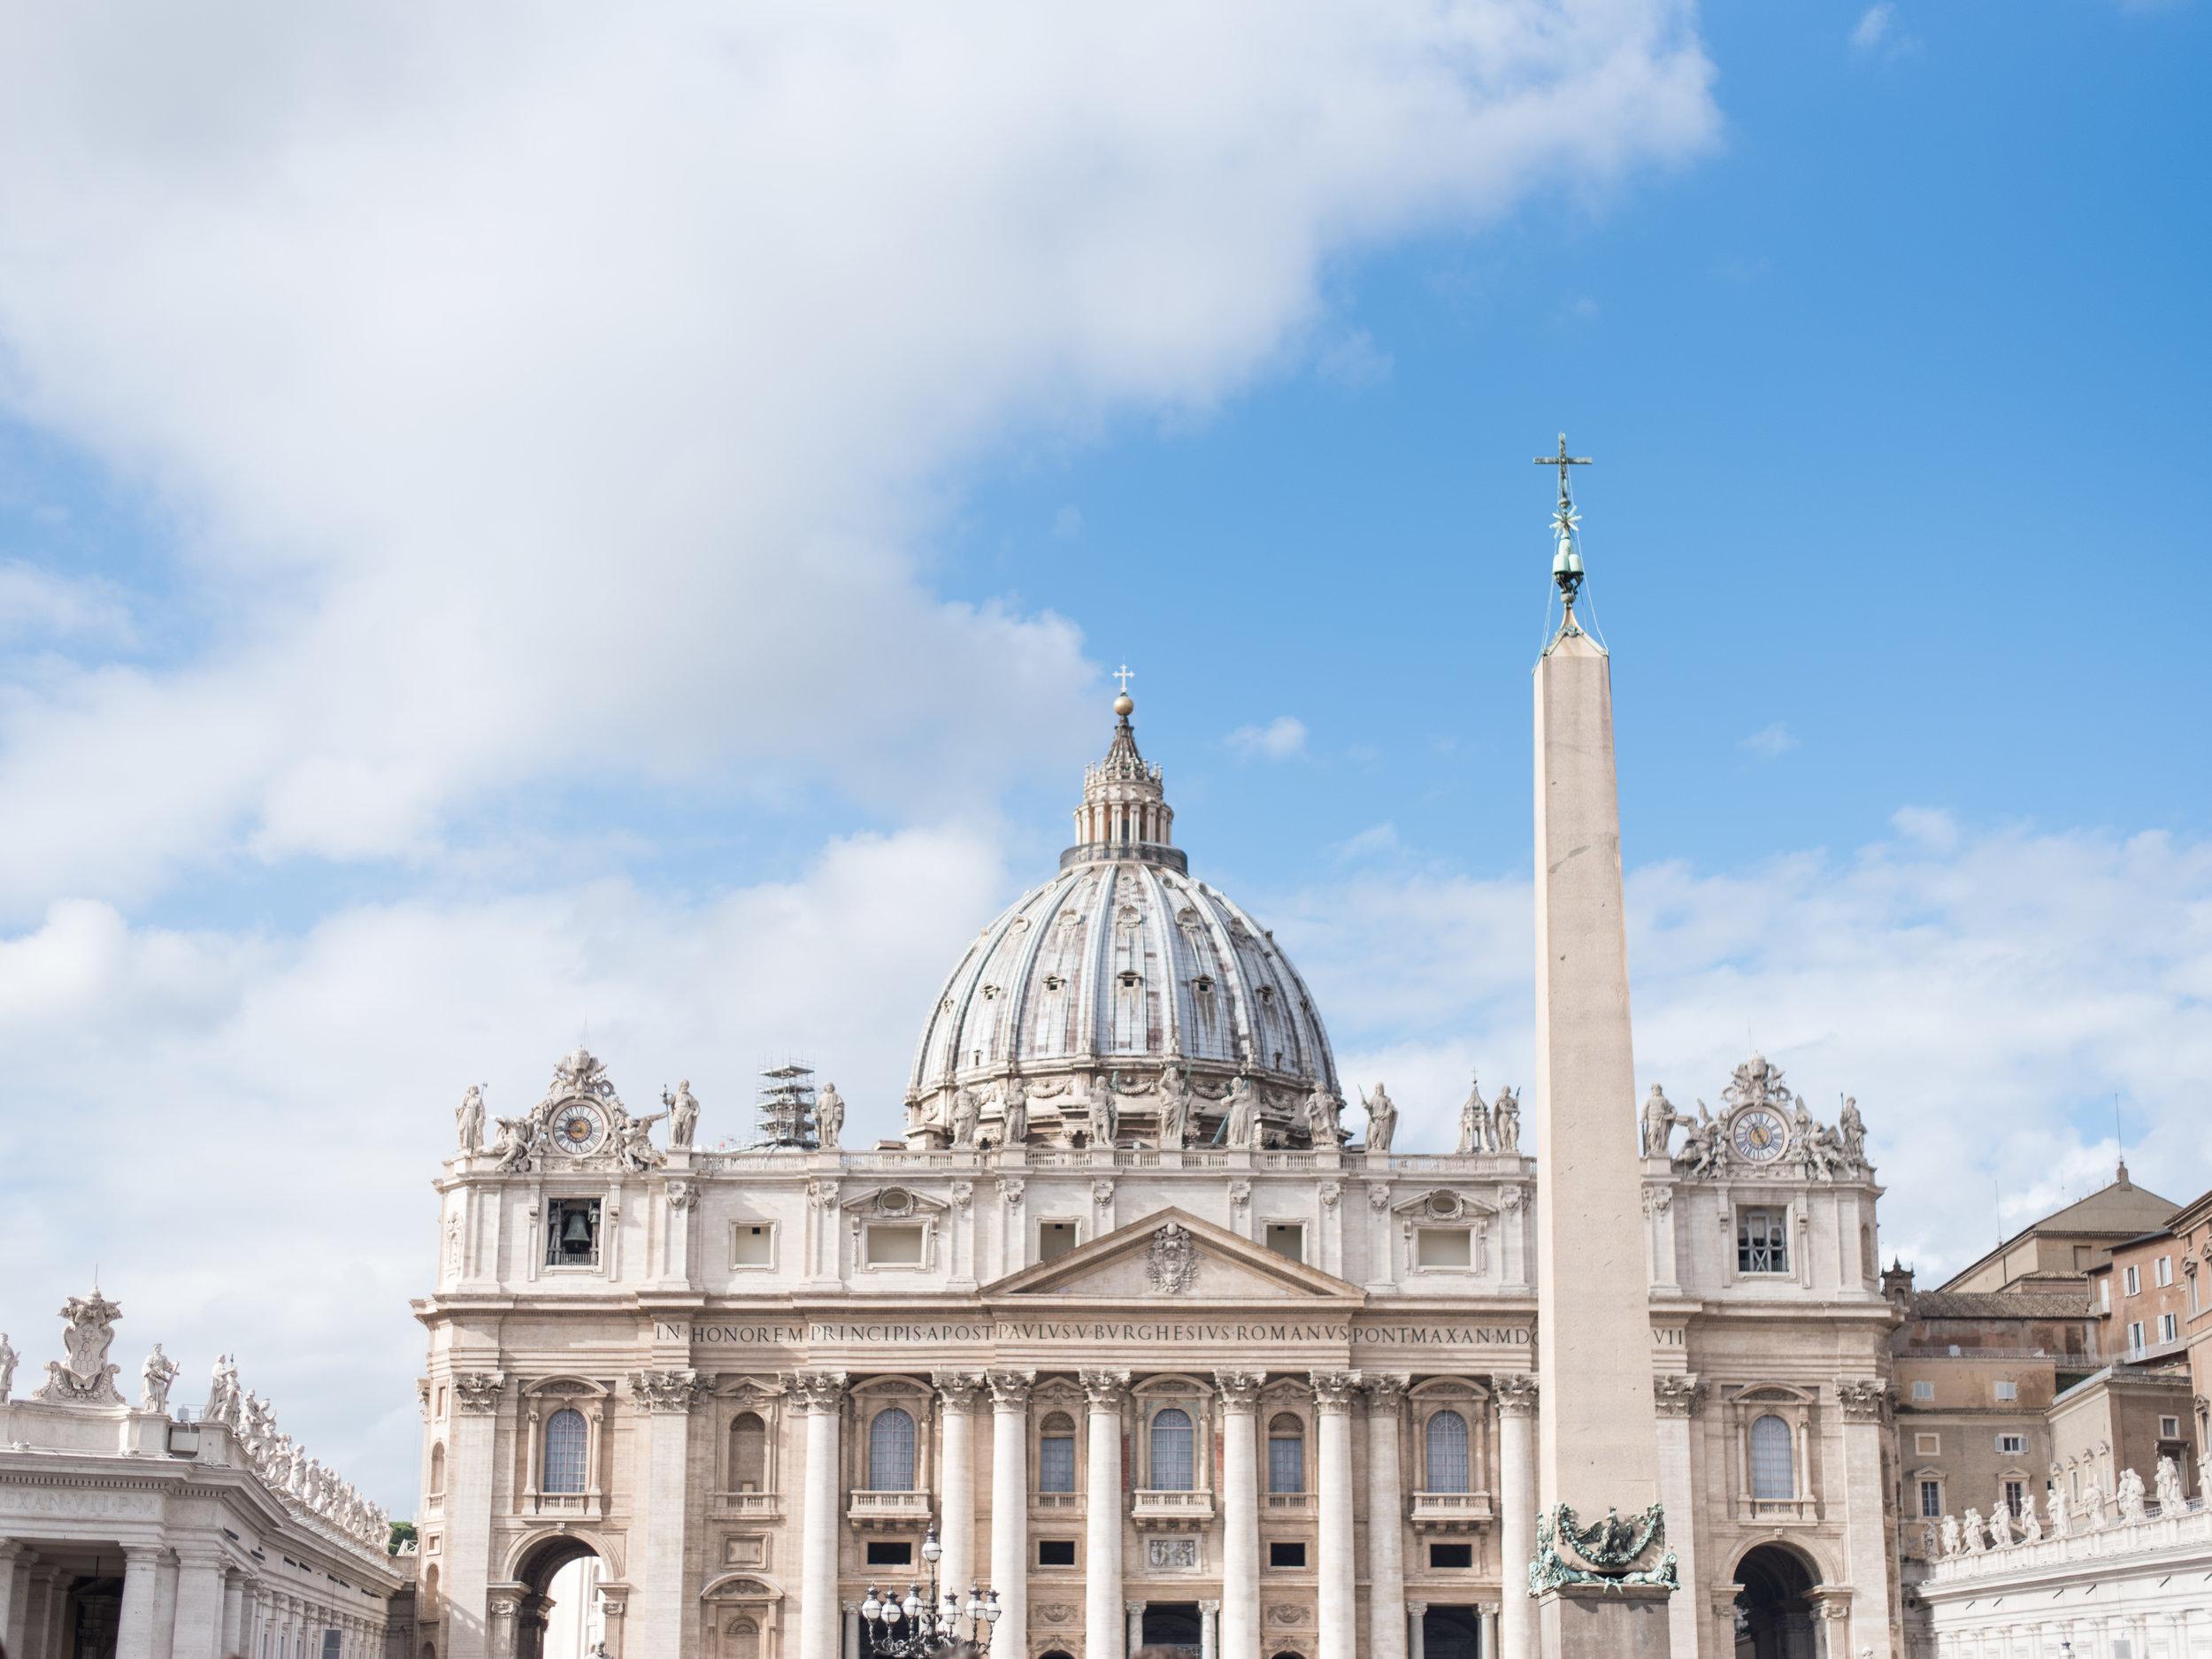 St Peters Basilica, Vatican Square